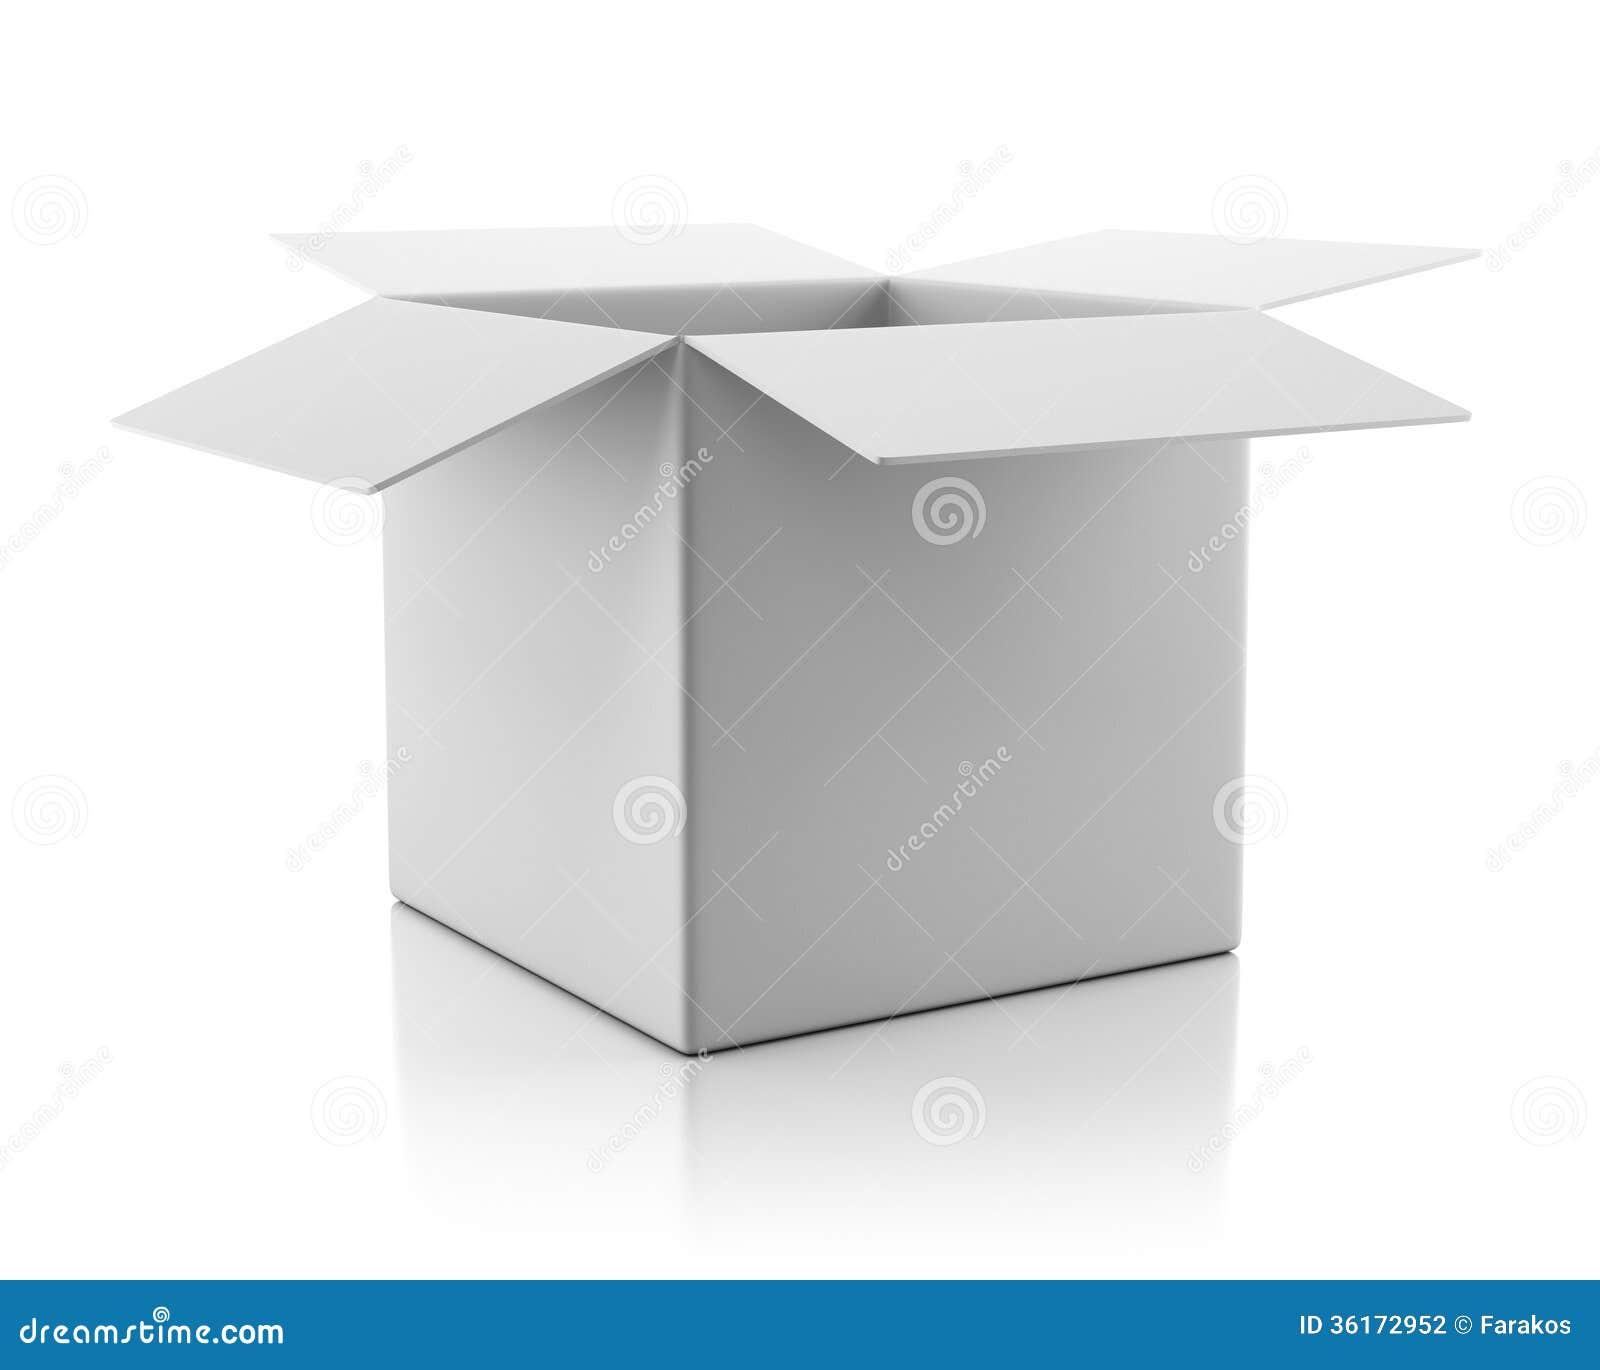 Прикройте открытую пустую белую картонную коробку